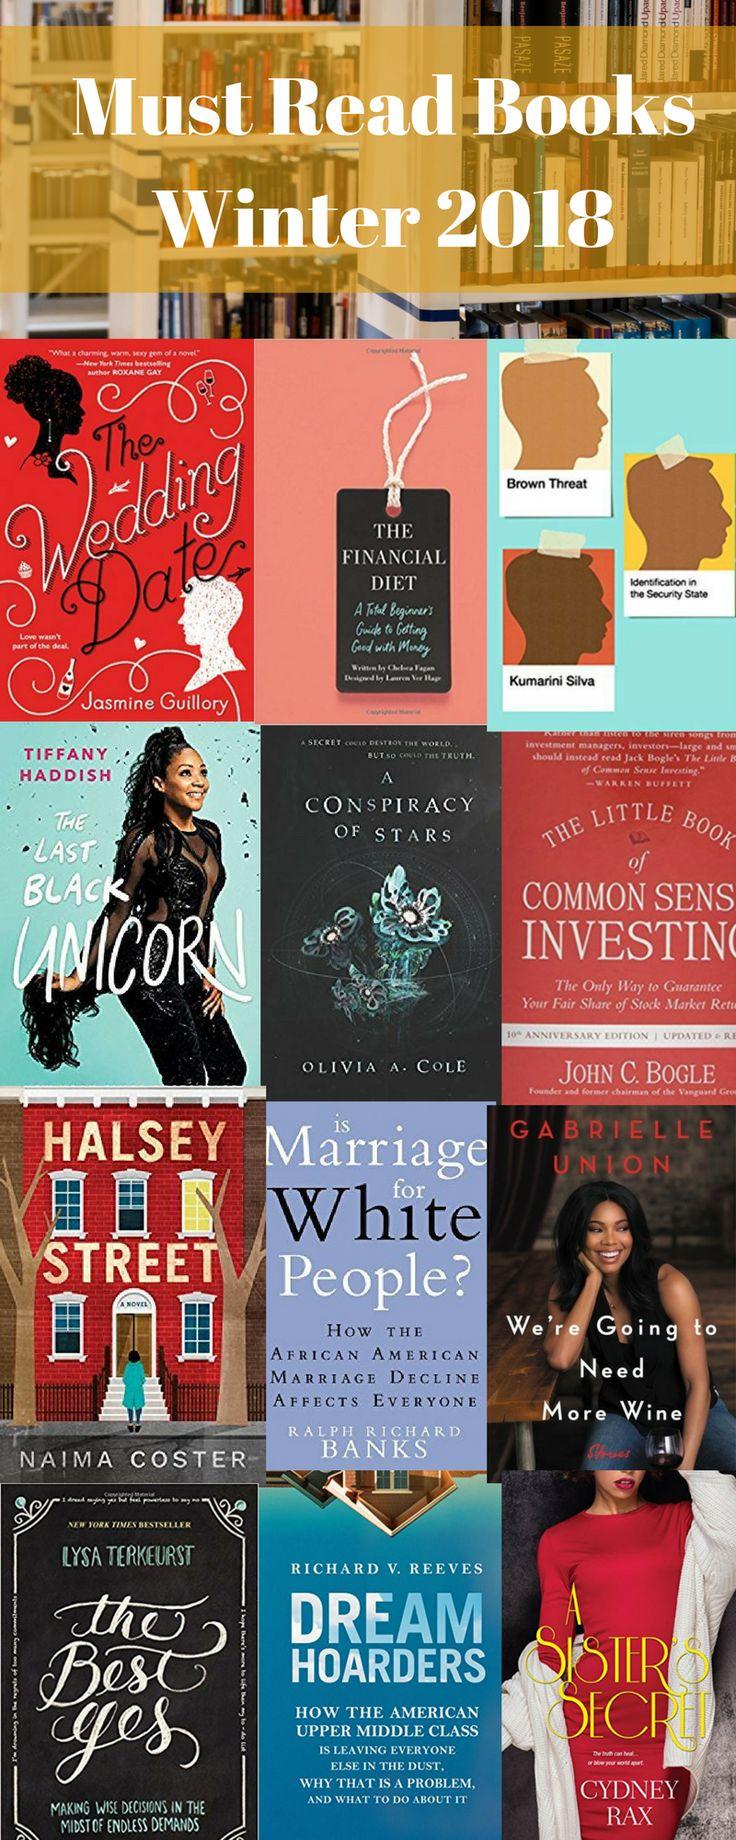 tbr list, winter reading list 2018, 2018 reading list,book release 2018, reading list for women,diverse books, #books